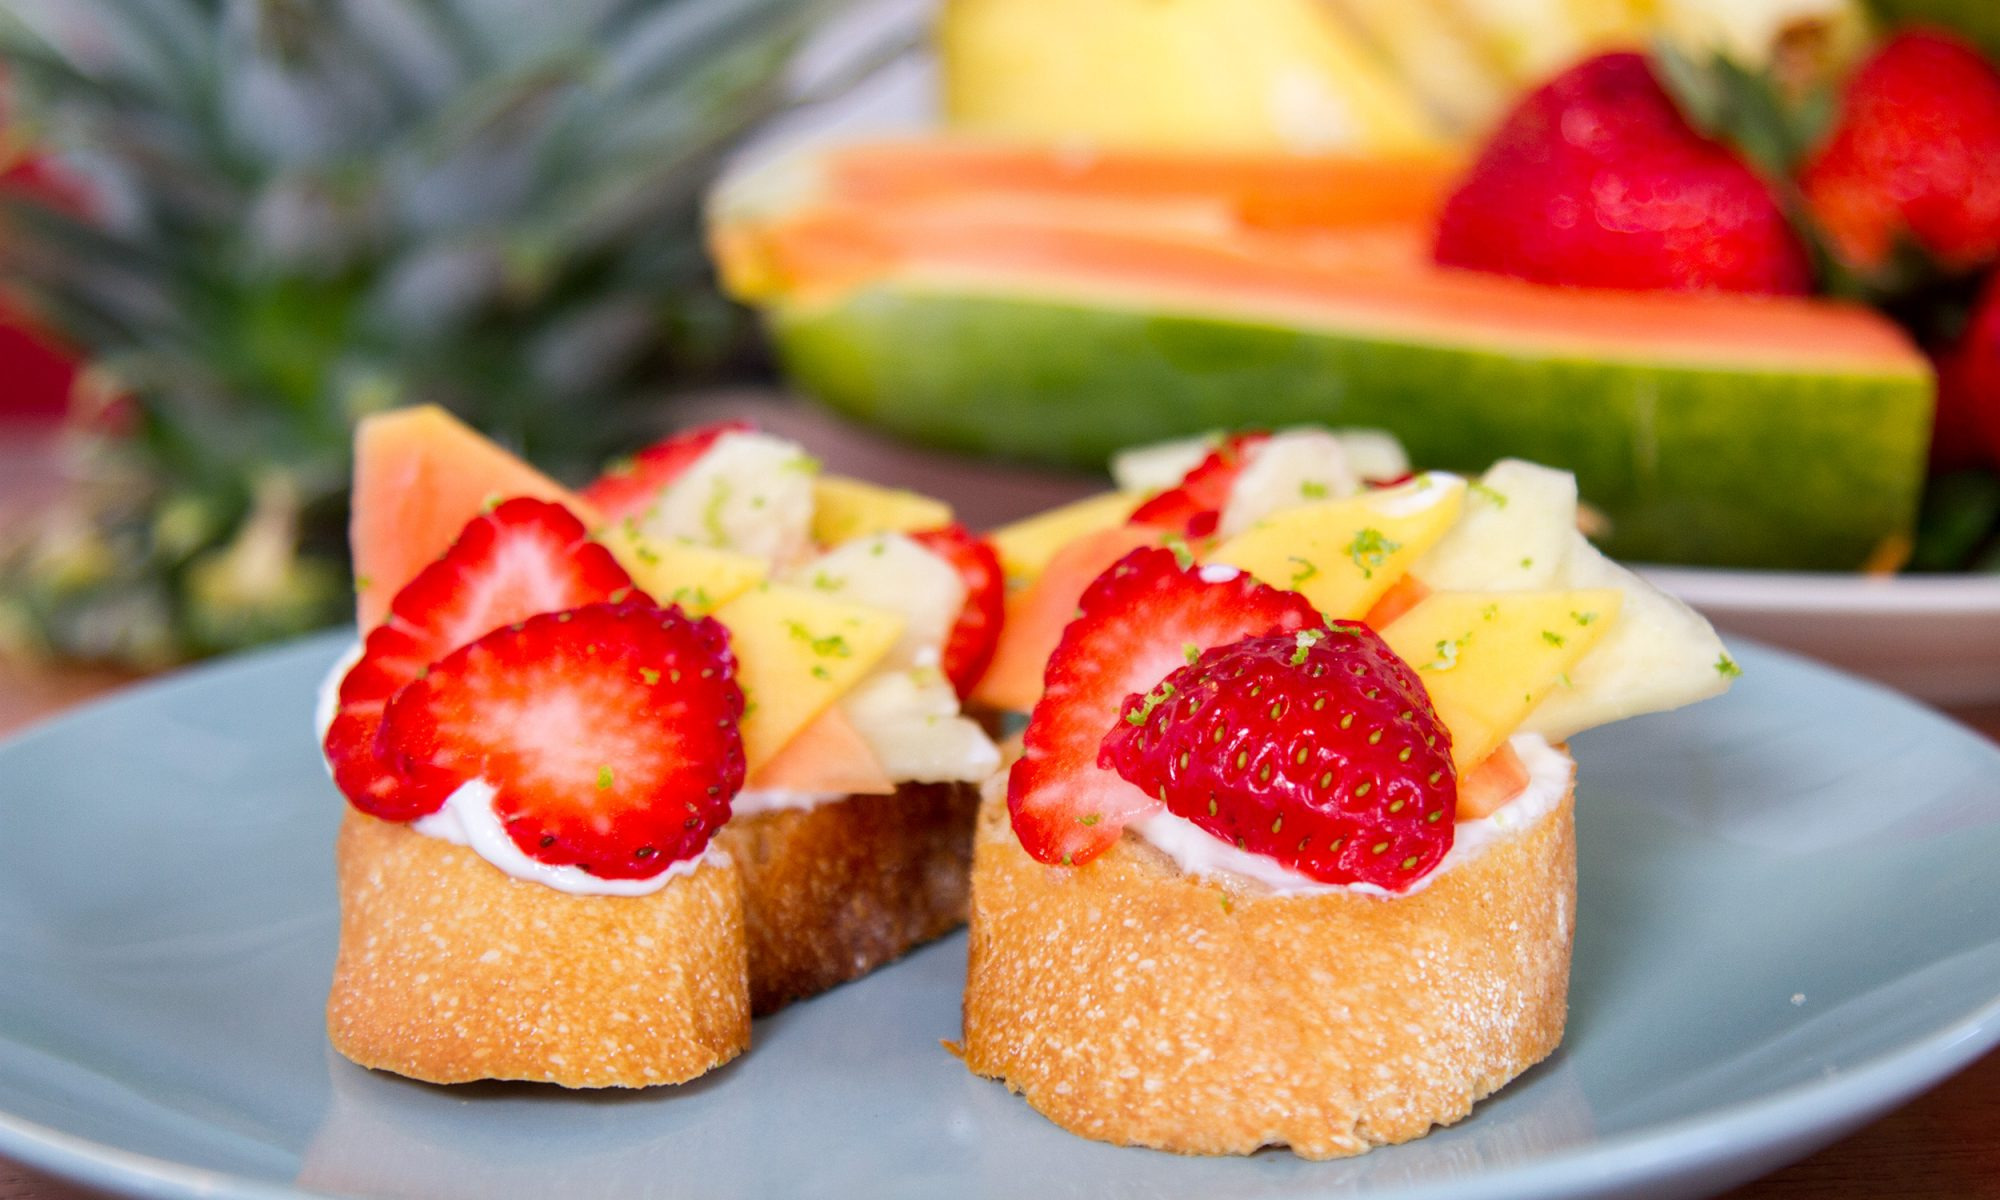 EC: This Multicolored Breakfast Bruschetta Is a Tropical Island on Sliced Bread